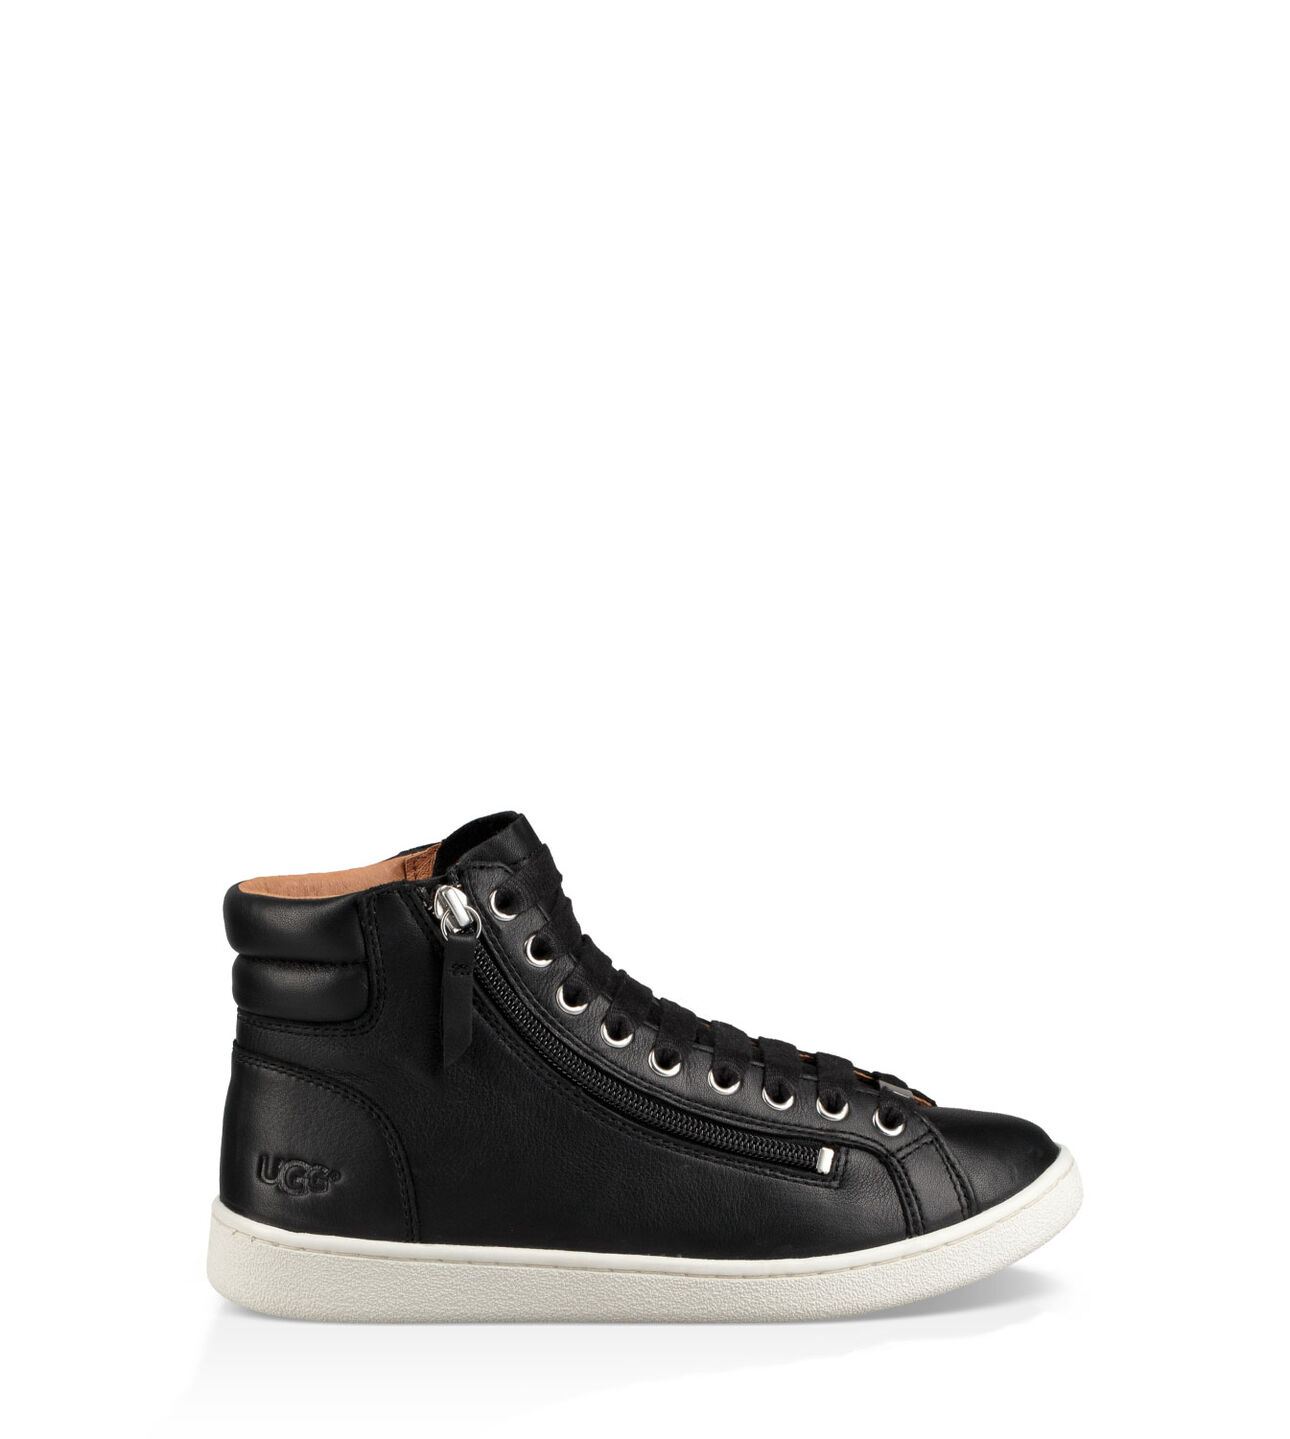 Ugg Womens Fashion Olive Sneaker Black